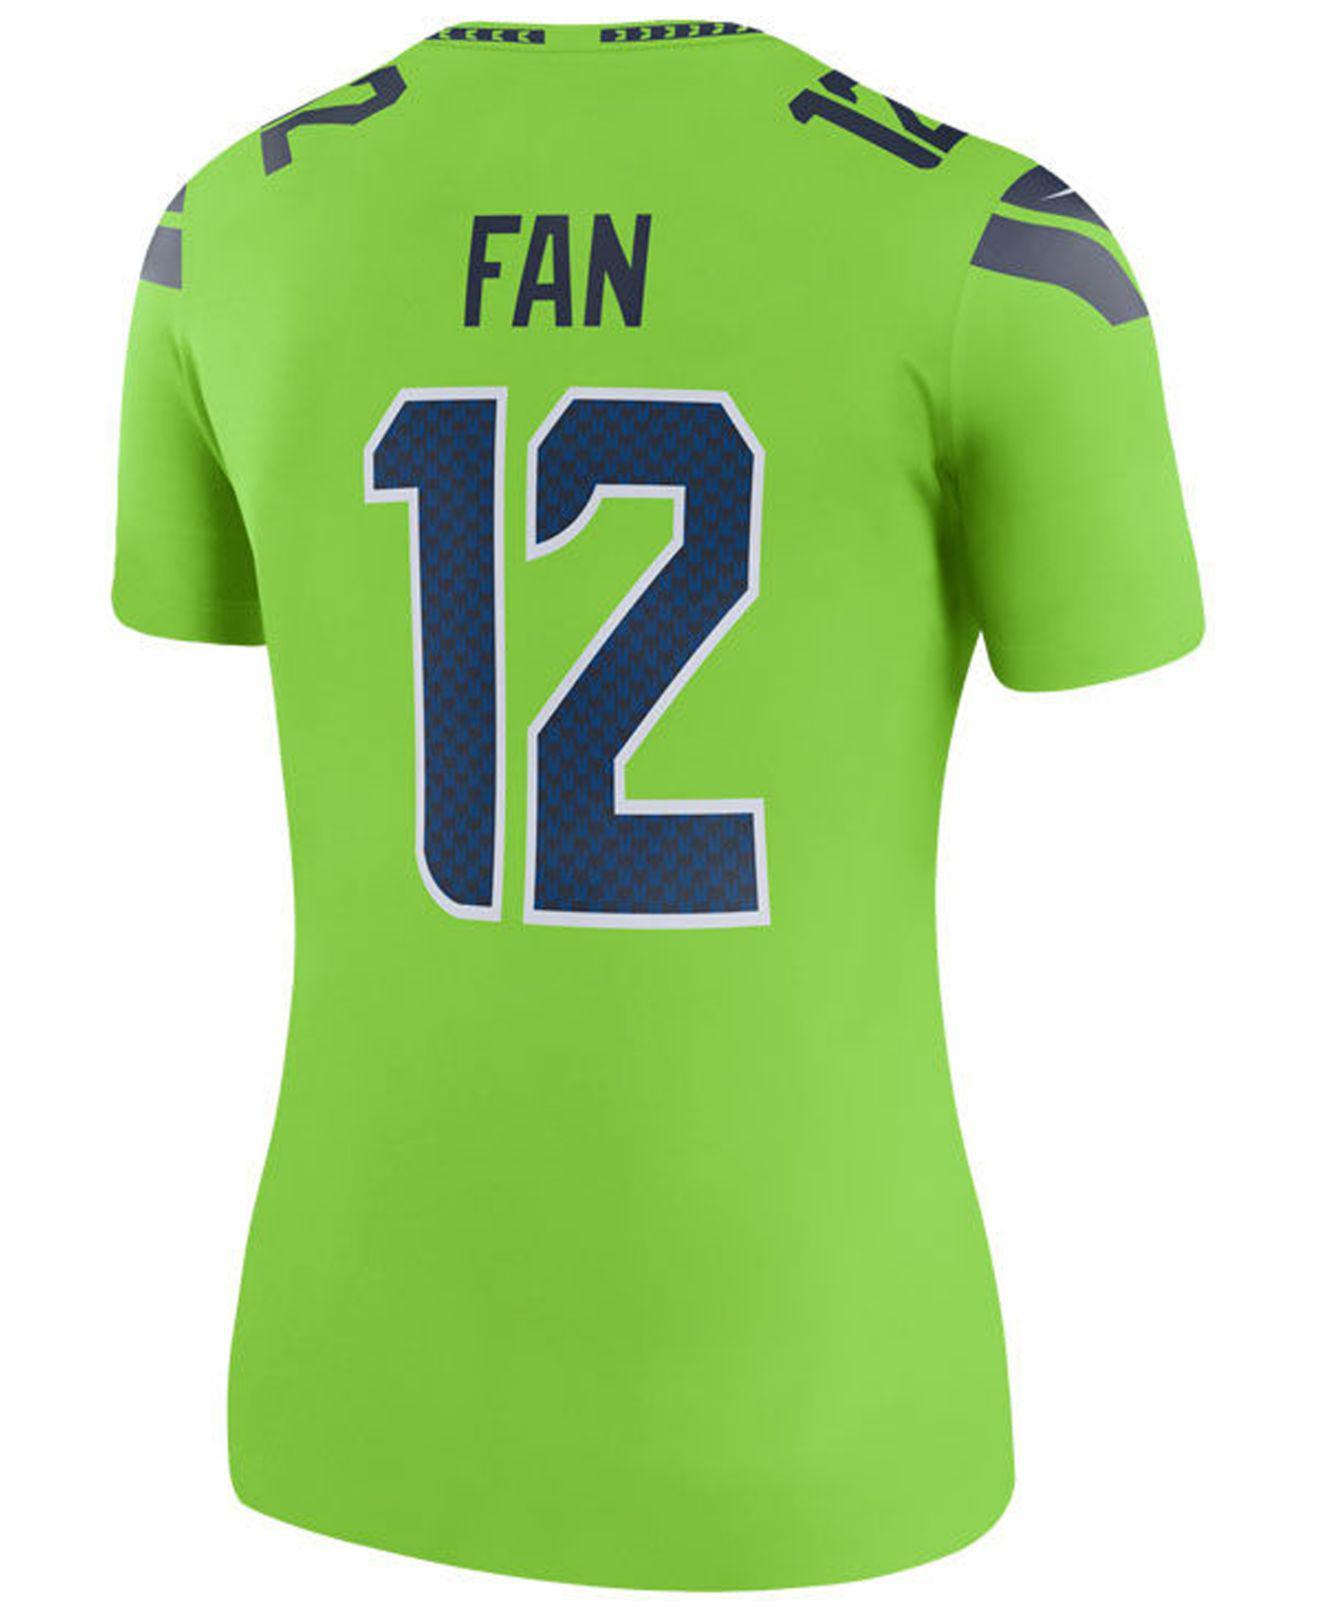 canada seattle seahawks bright green jersey cb123 5f3f3